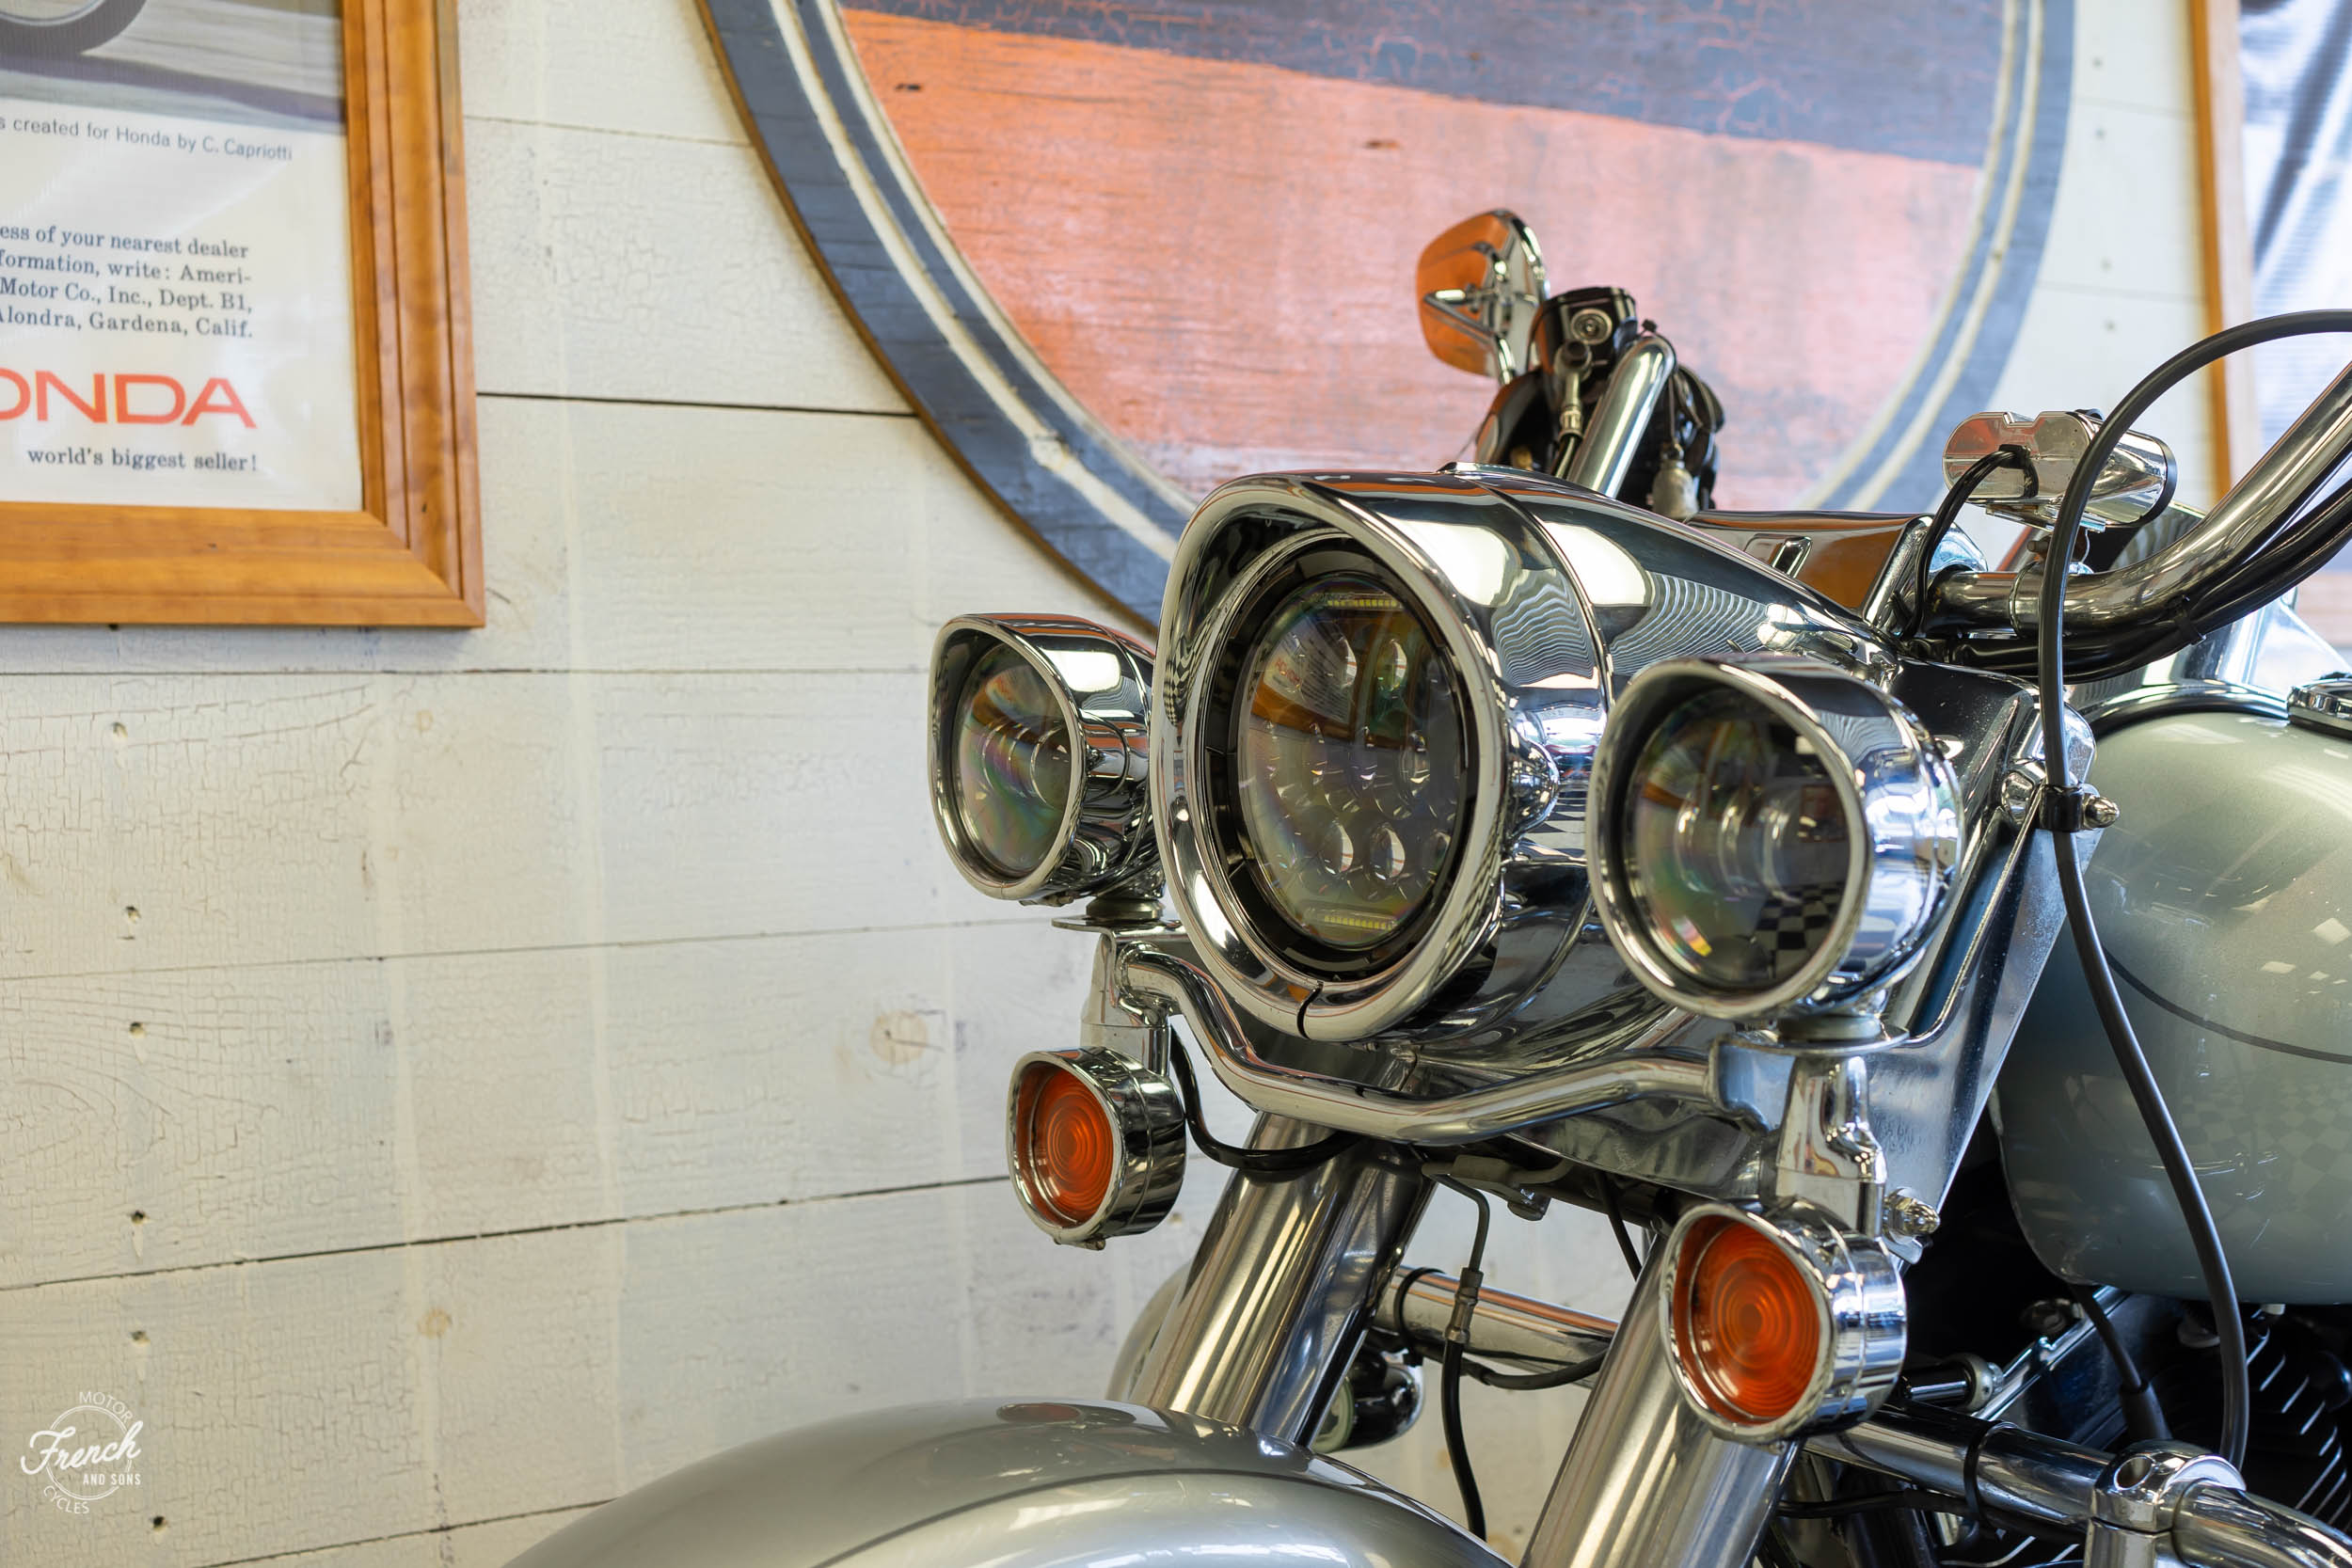 2011_Harley_davidson_road_king_silver-24.jpg